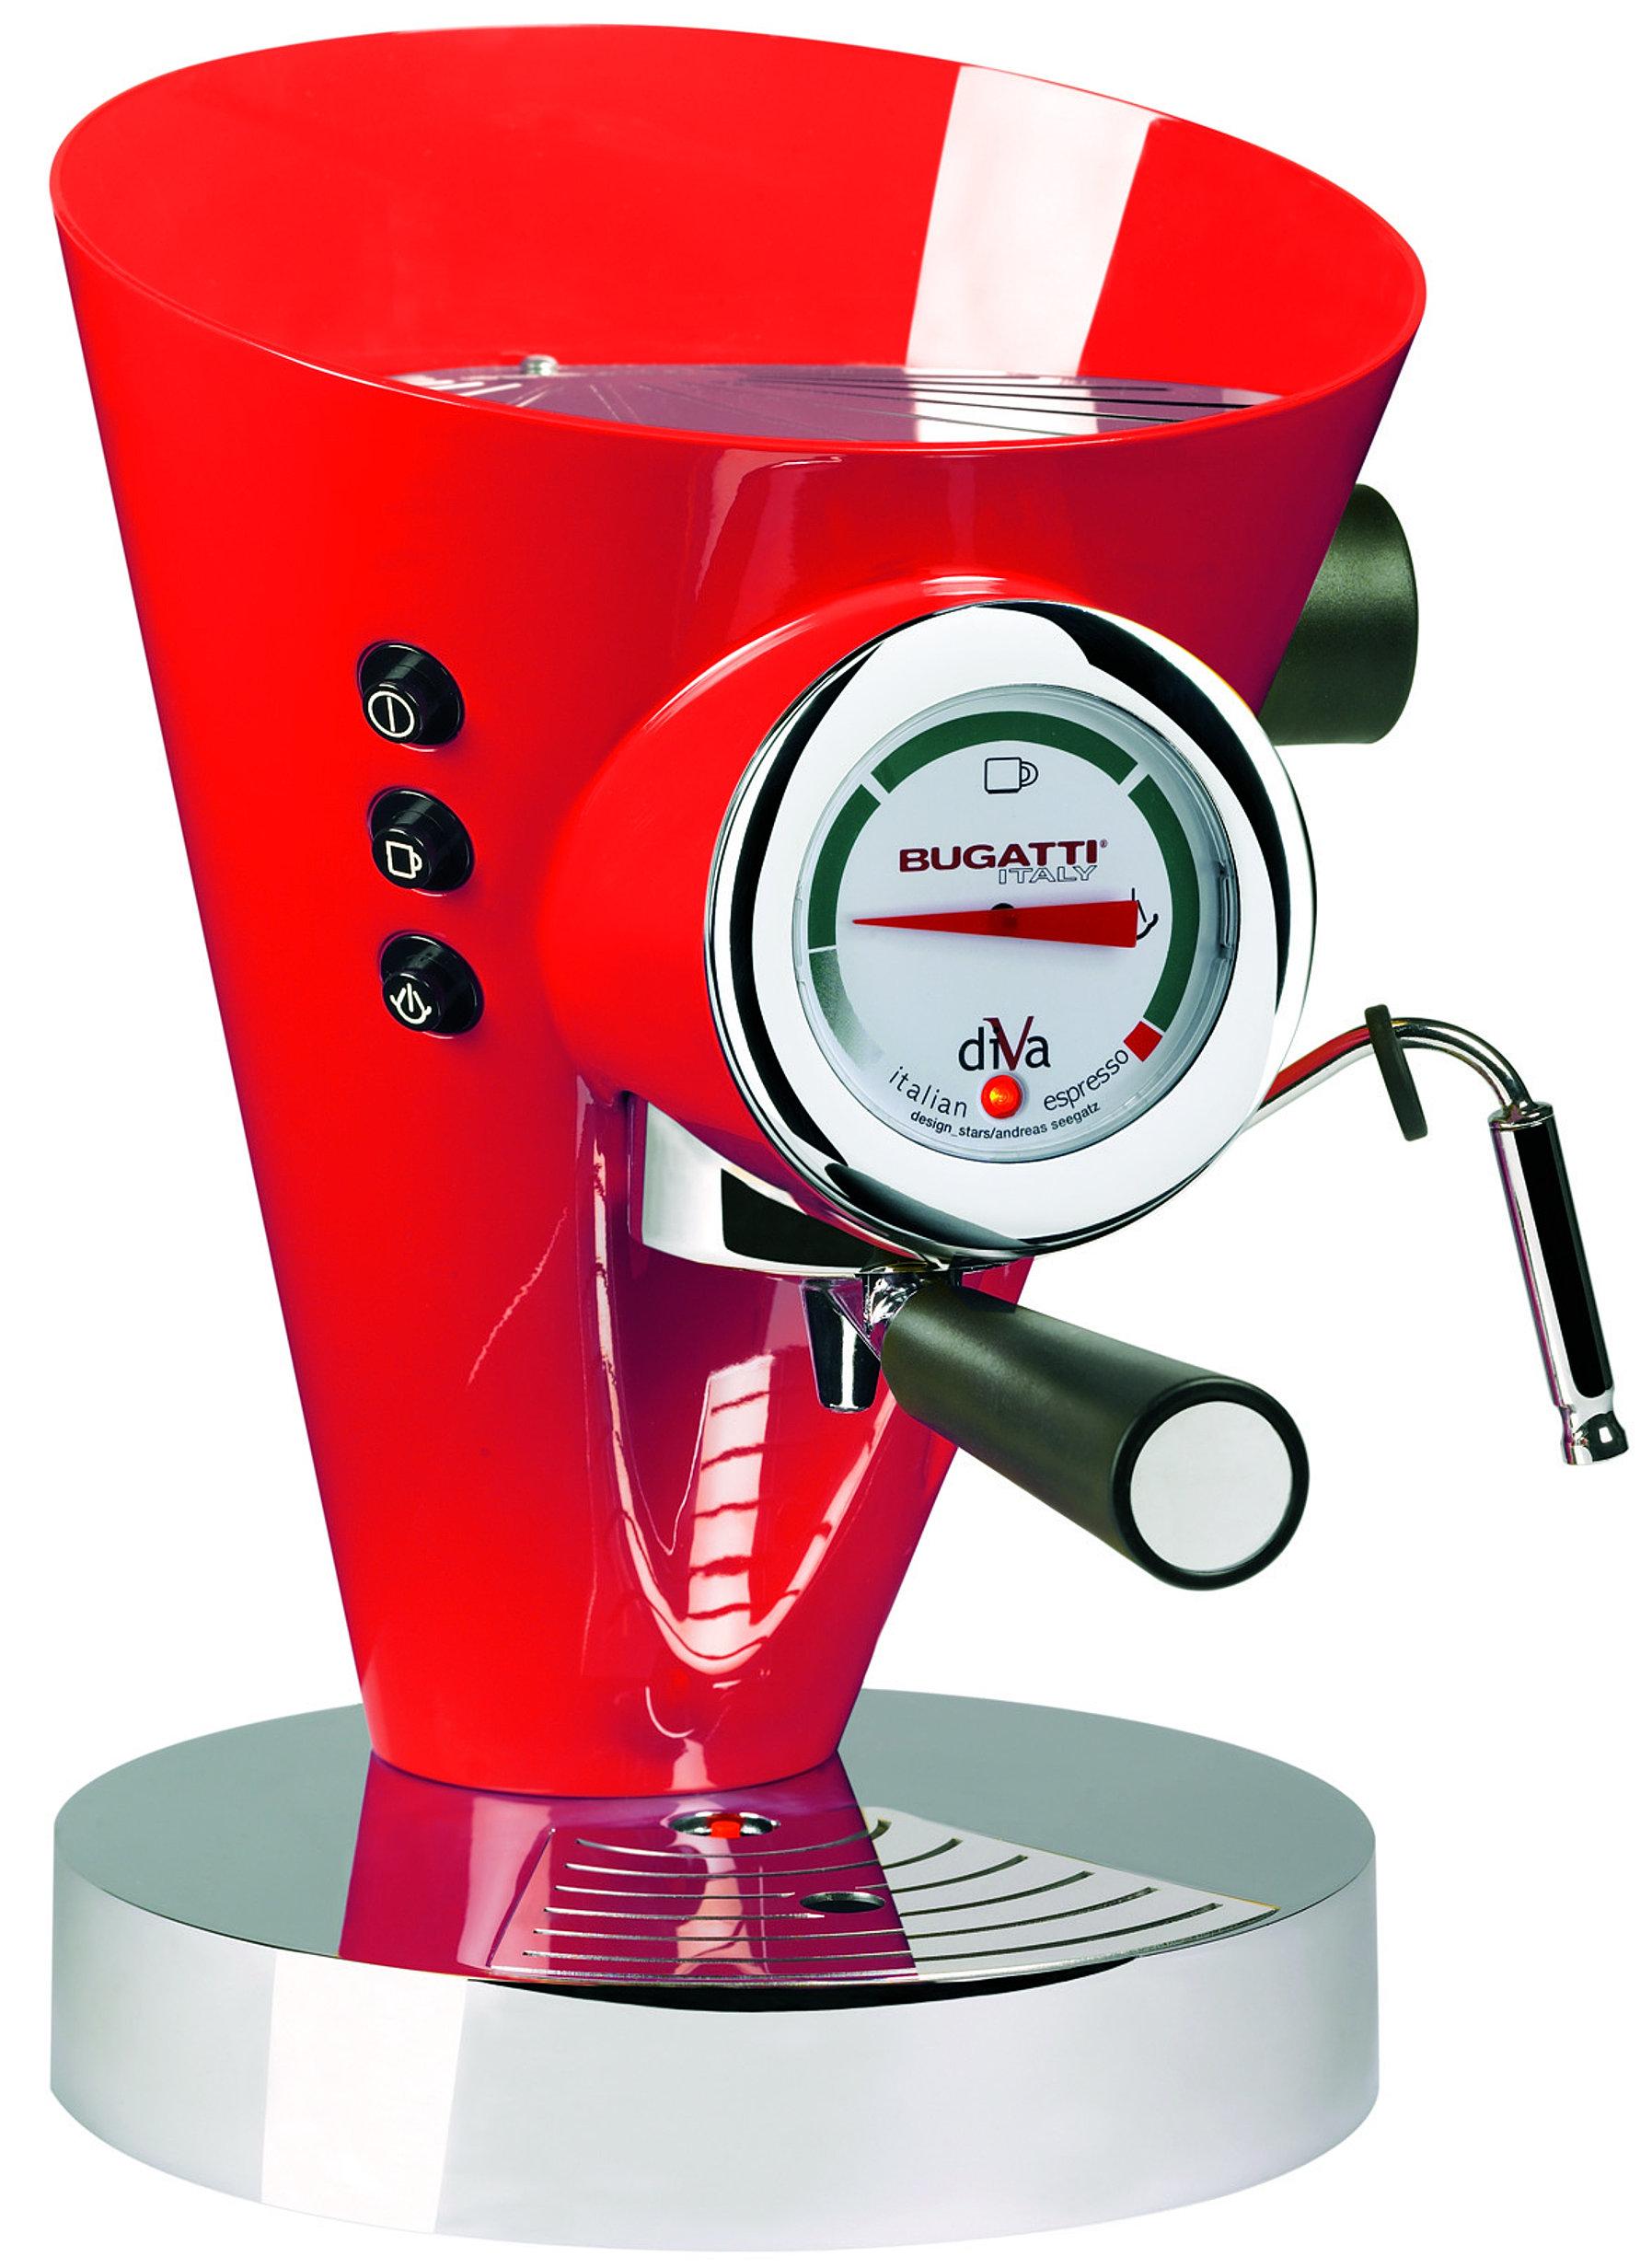 Bugatti Appliances. B15 DIVAC3N DIVA COFFEE MACHINE RED